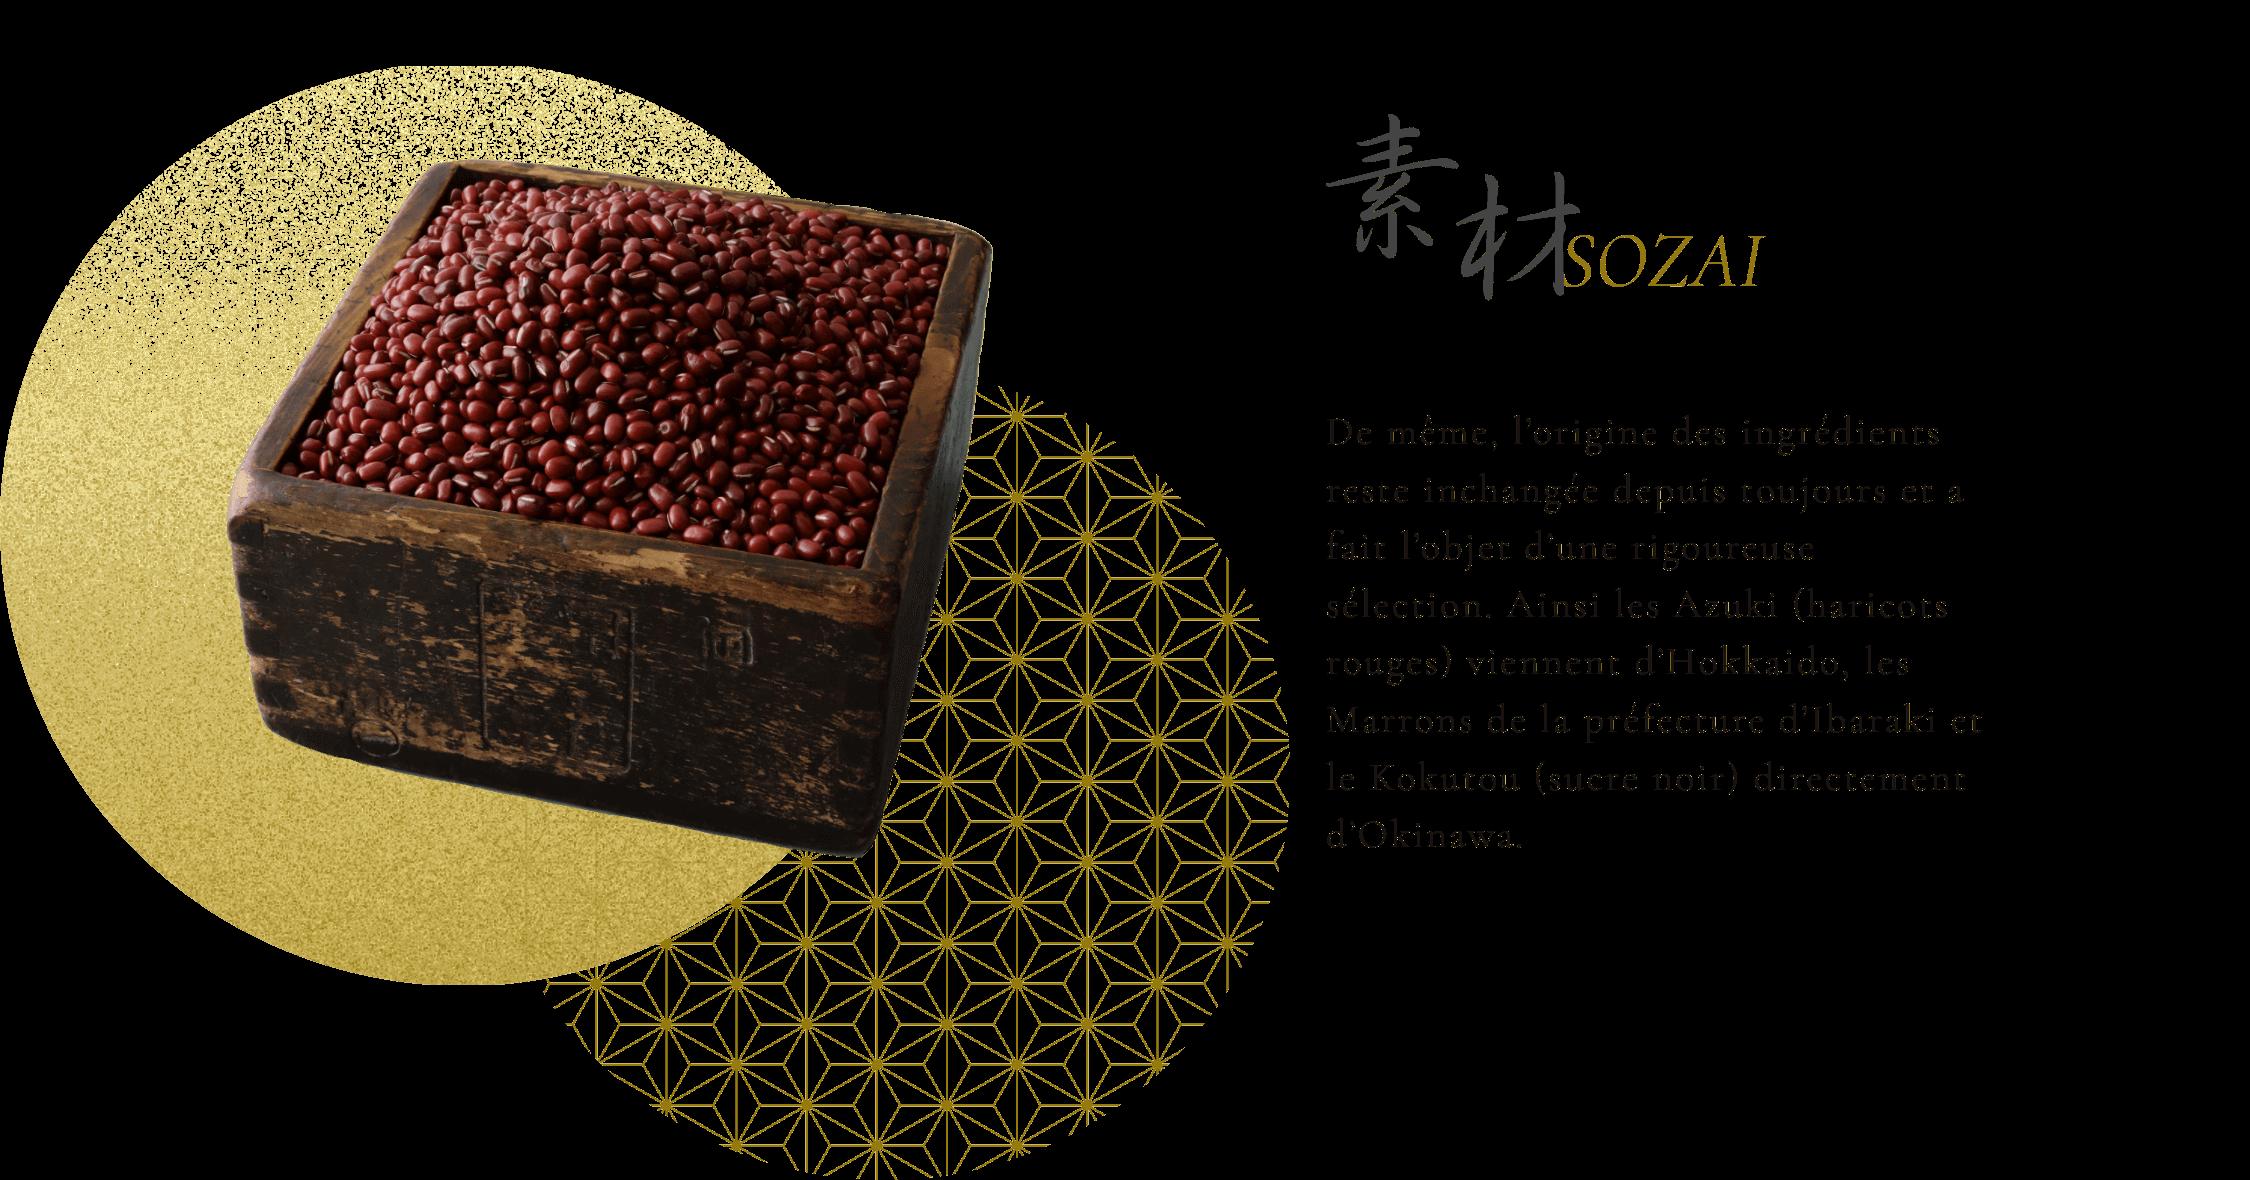 素材 De même, l'origine des ingrédients reste inchangée depuis toujours et a fait l'objet d'une rigoureuse sélection. Ainsi les Azuki (haricots rouges) viennent d'Hokkaido, les Marrons de la préfecture d'Ibaraki et le Kokutou (sucre noir) directement d'Okinawa.